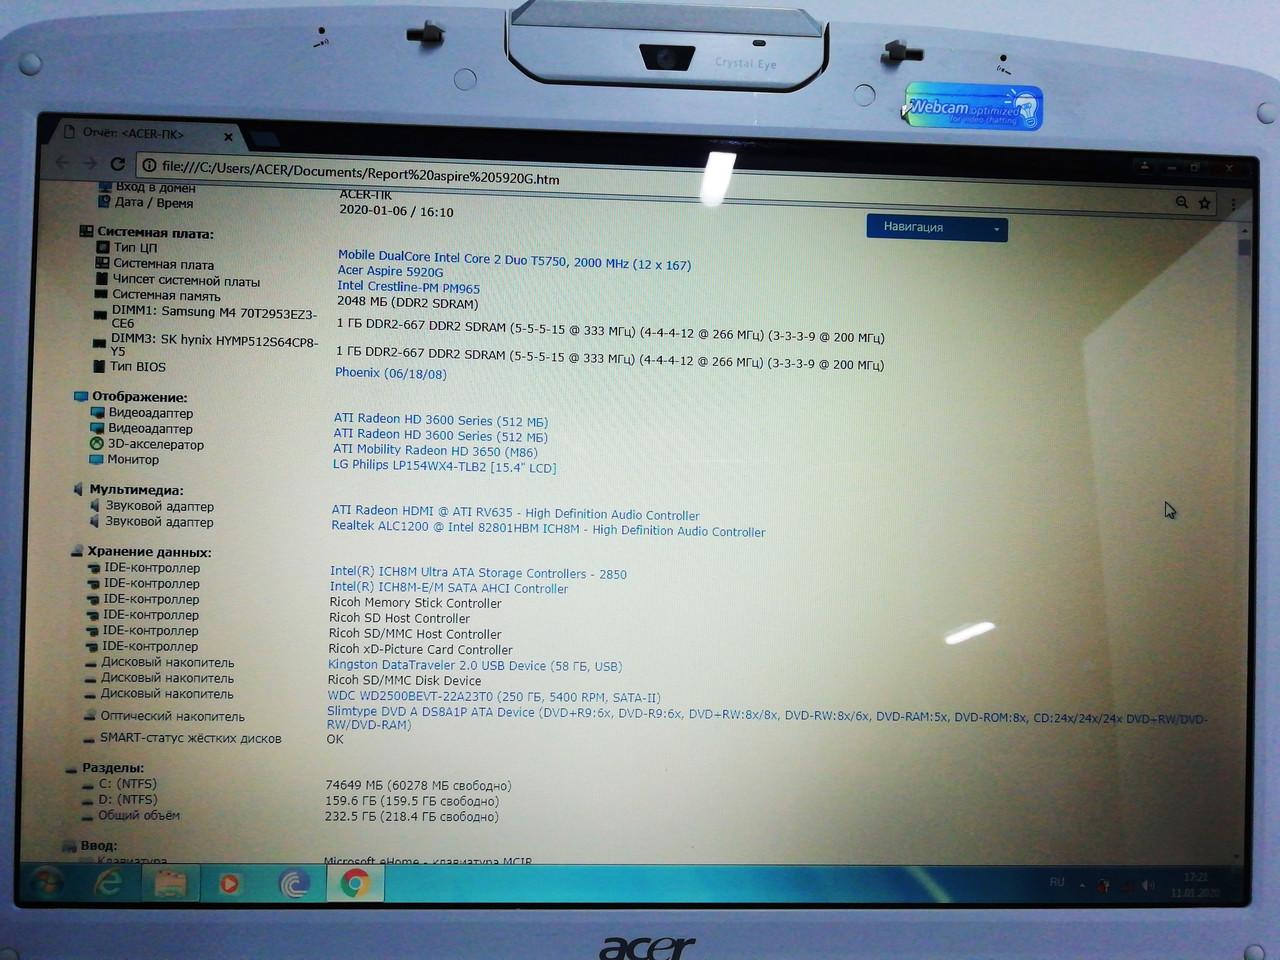 Ноутбук под игры Acer Aspire 5920G Core2Duo и Radeon HD3650 512mb